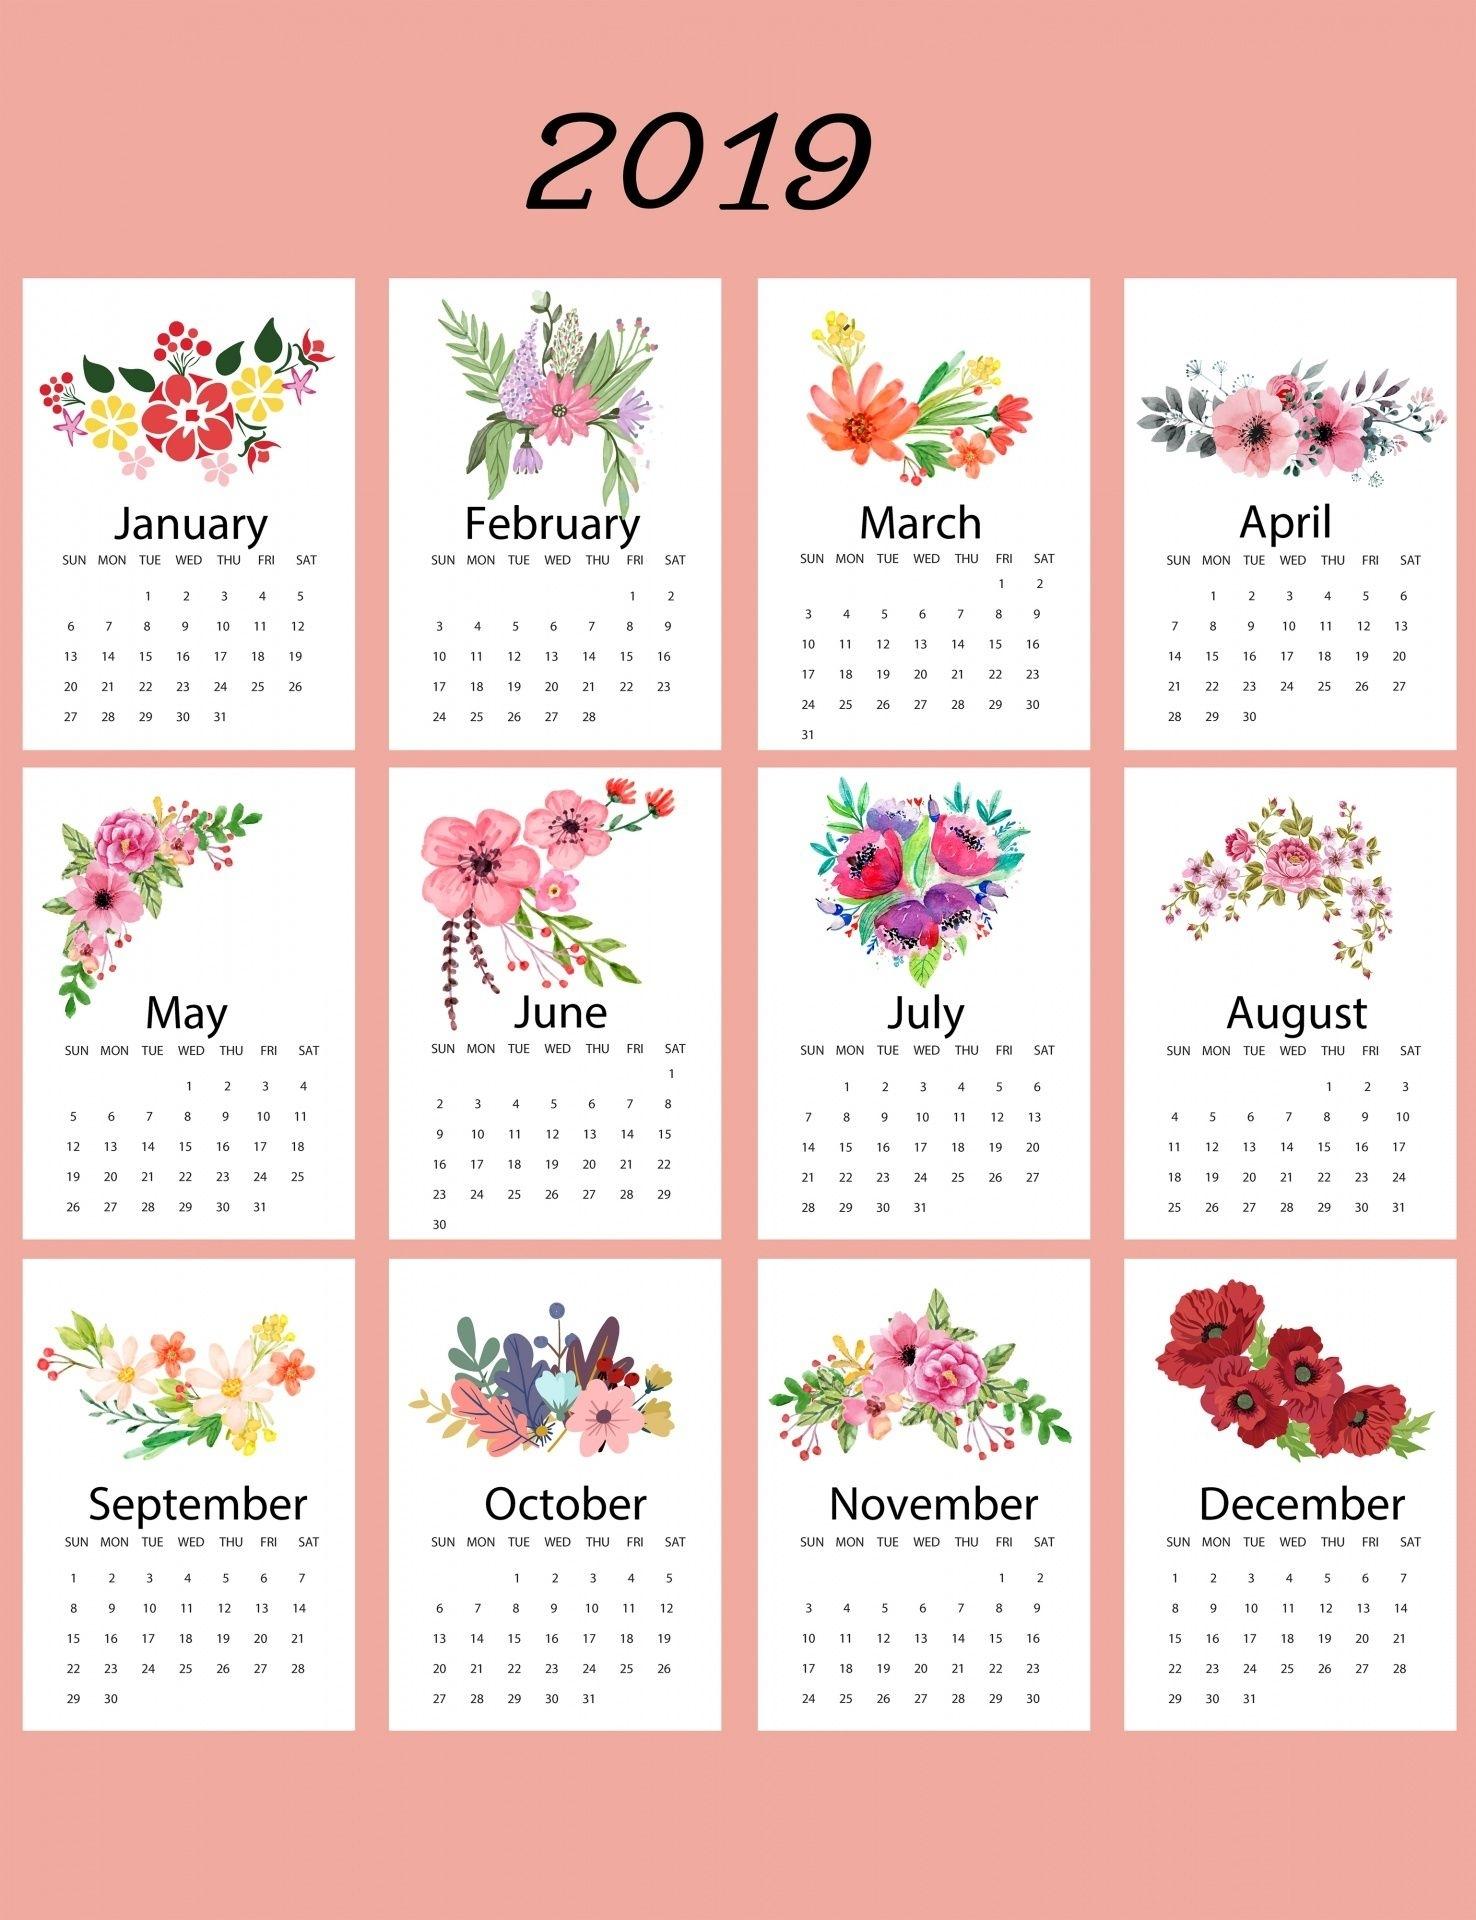 2019 Calendar Floral Template | Calendar 2019 Printable regarding Bc Free 2020 At A Glance Calendar